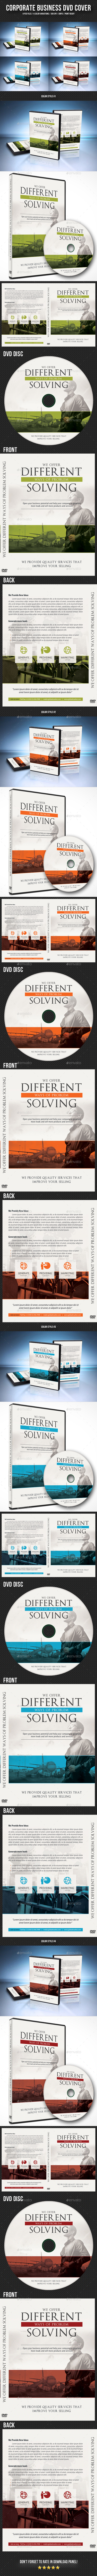 Corporate Business DVD Cover Template V10 - CD & DVD Artwork Print Templates